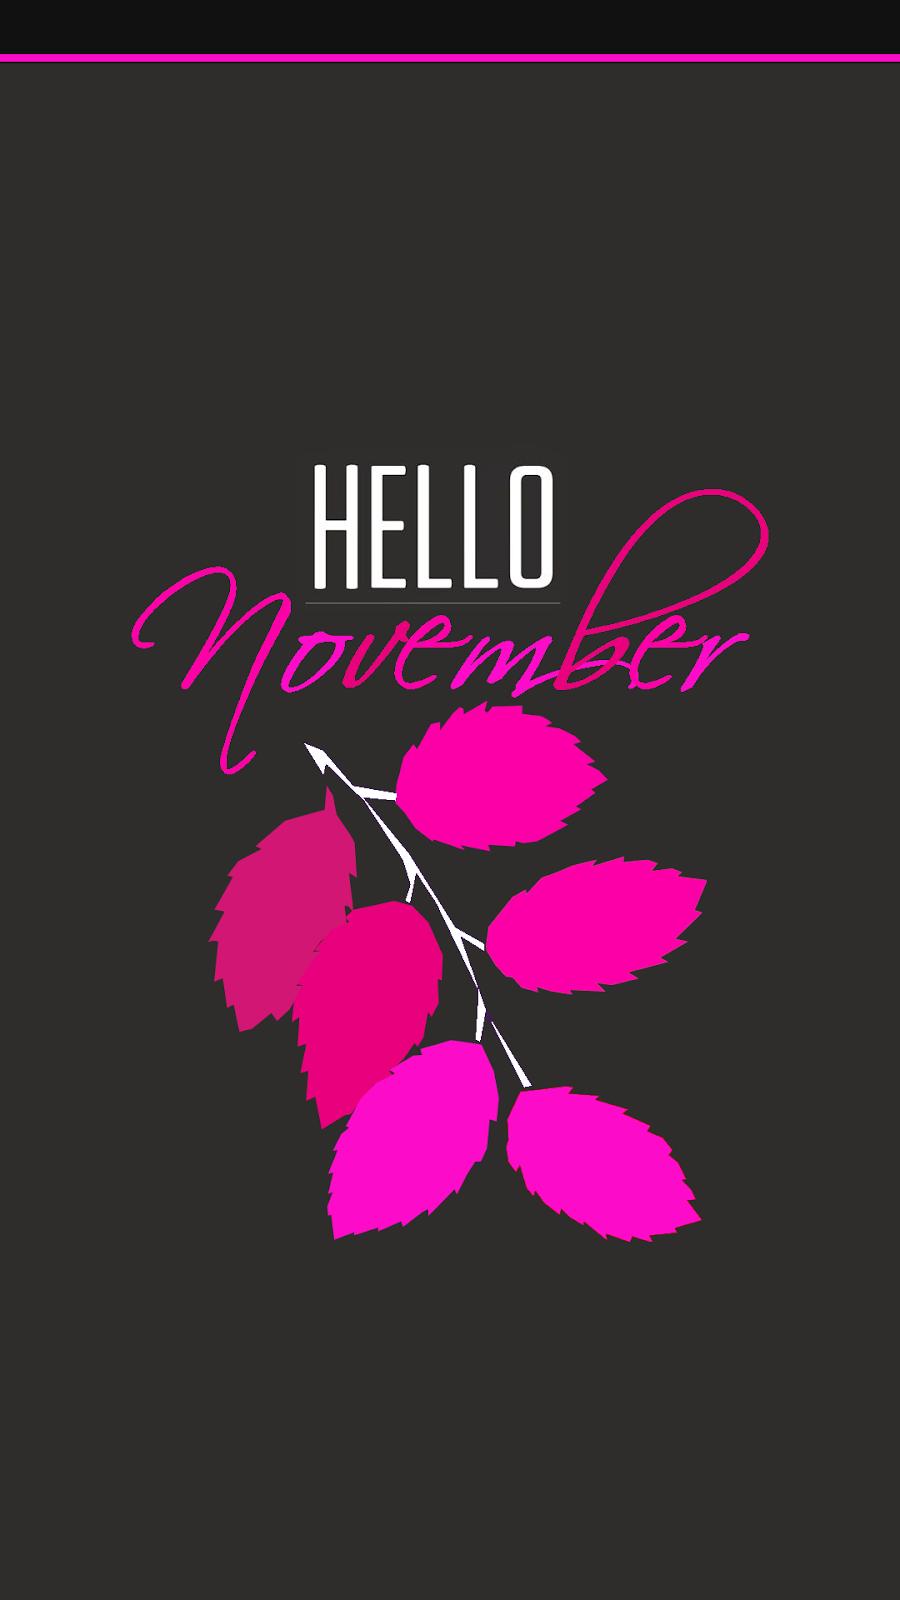 0November.png (900×1600) (With images) November